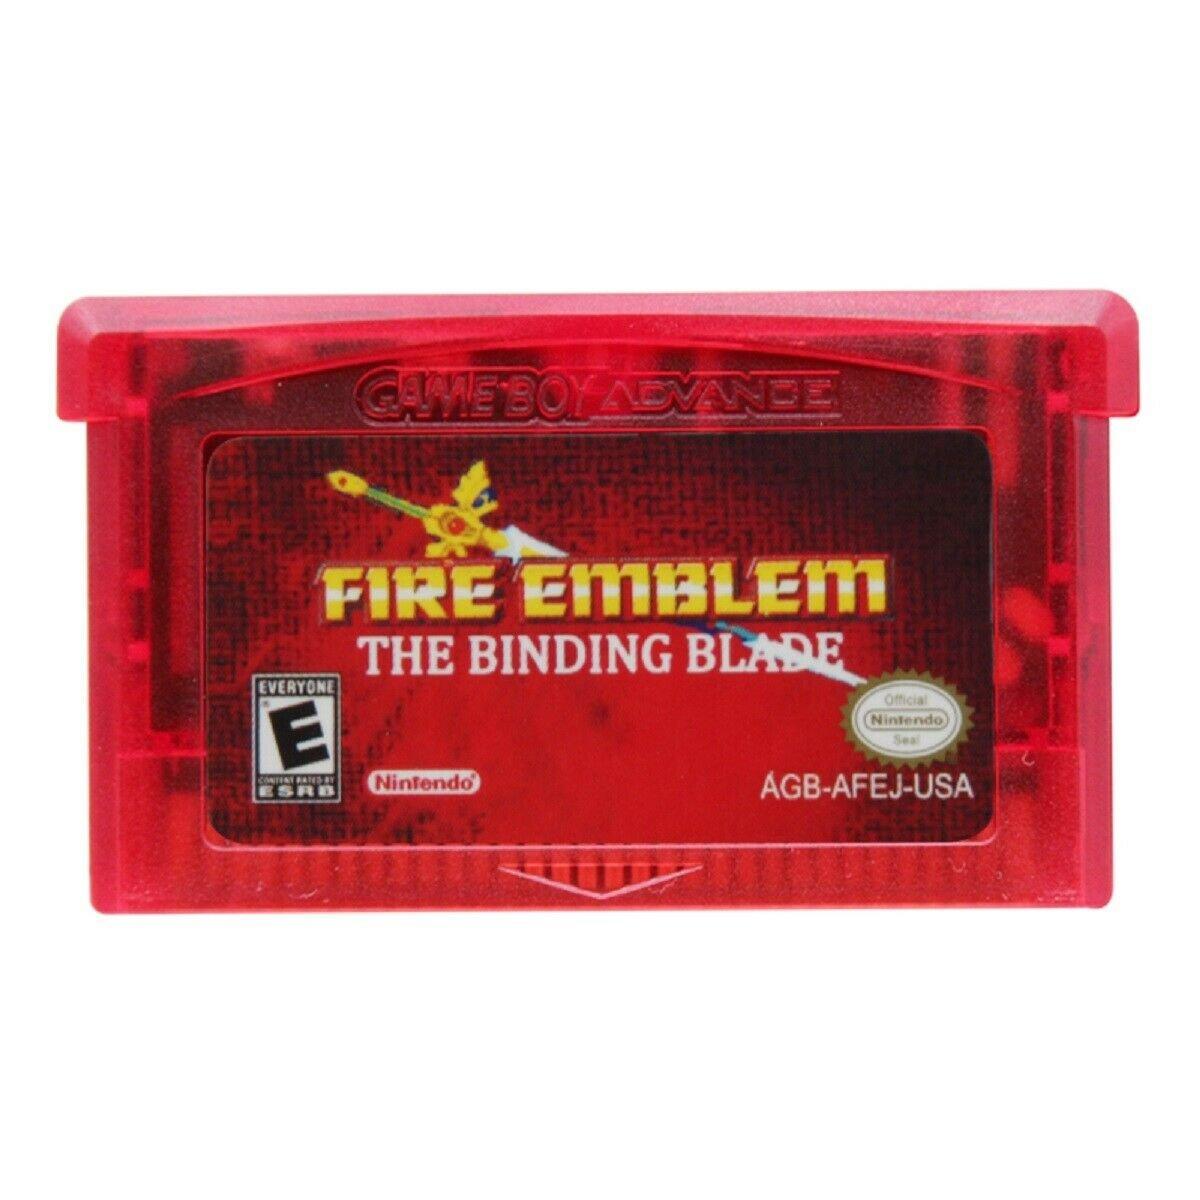 Fire Emblem-The Binding Blade Gameboy Advance (GBA)- Cartridge Card US Version